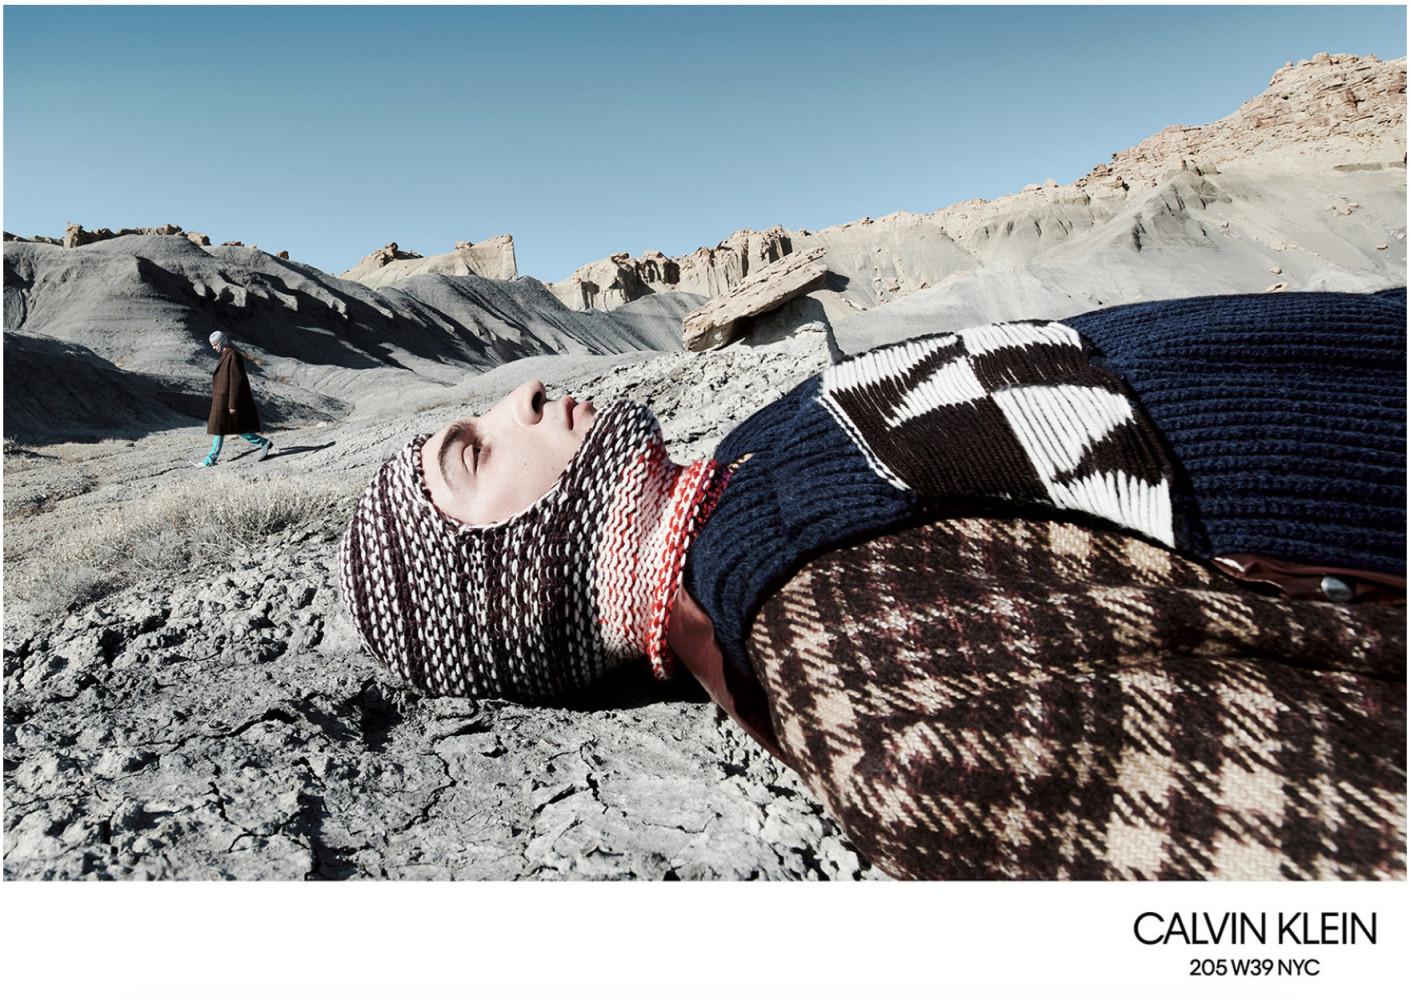 Luca Lemaire - Fernando Albaladejo - Willy Vanderperre - Calvin Klein FW 18